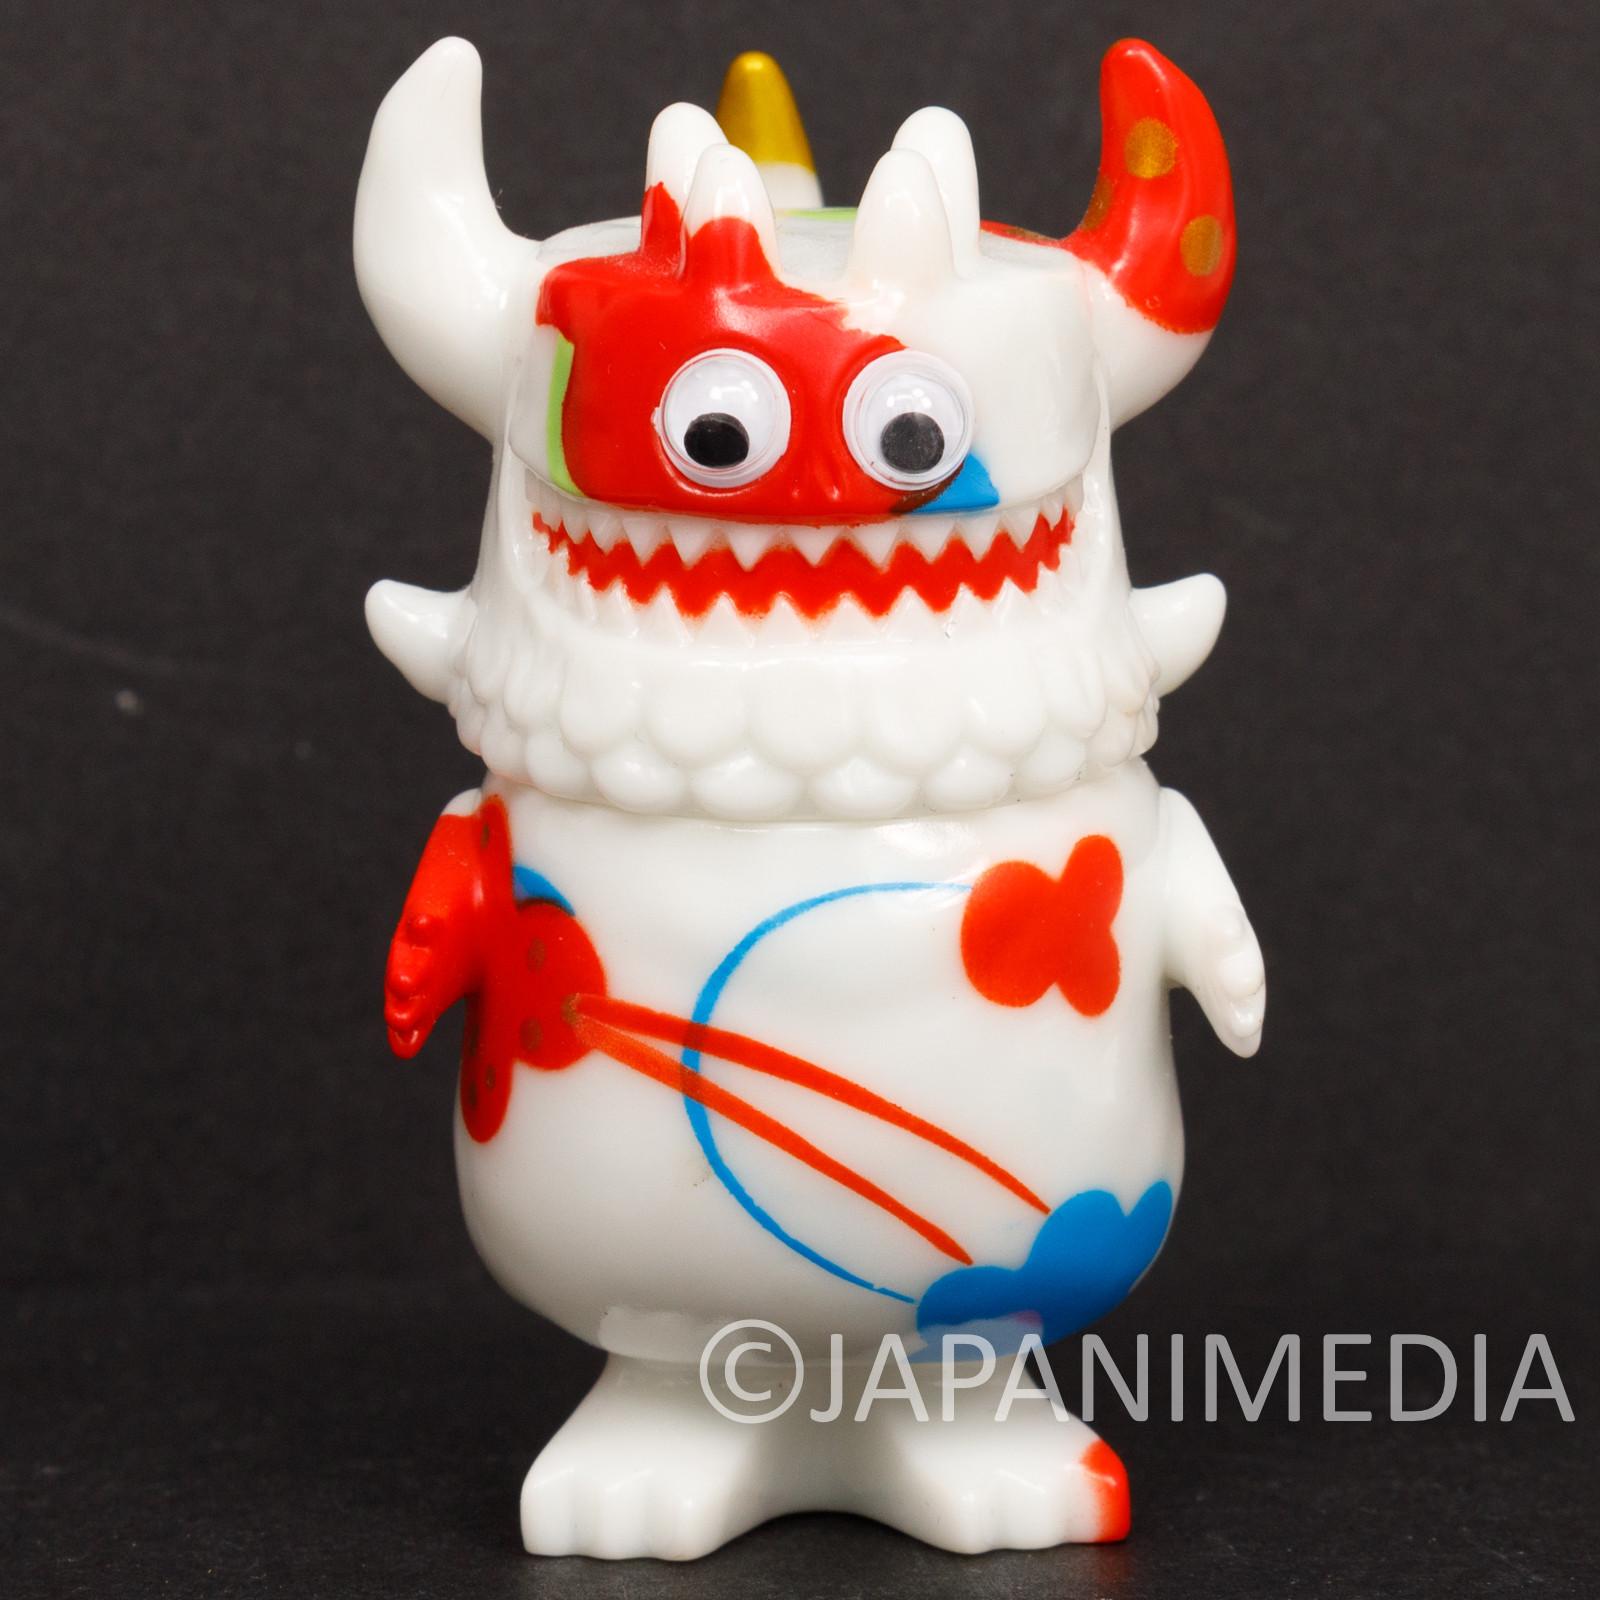 Rangeas Soft Vinyl Figure Medicom Toy VAG Series JAPAN 1